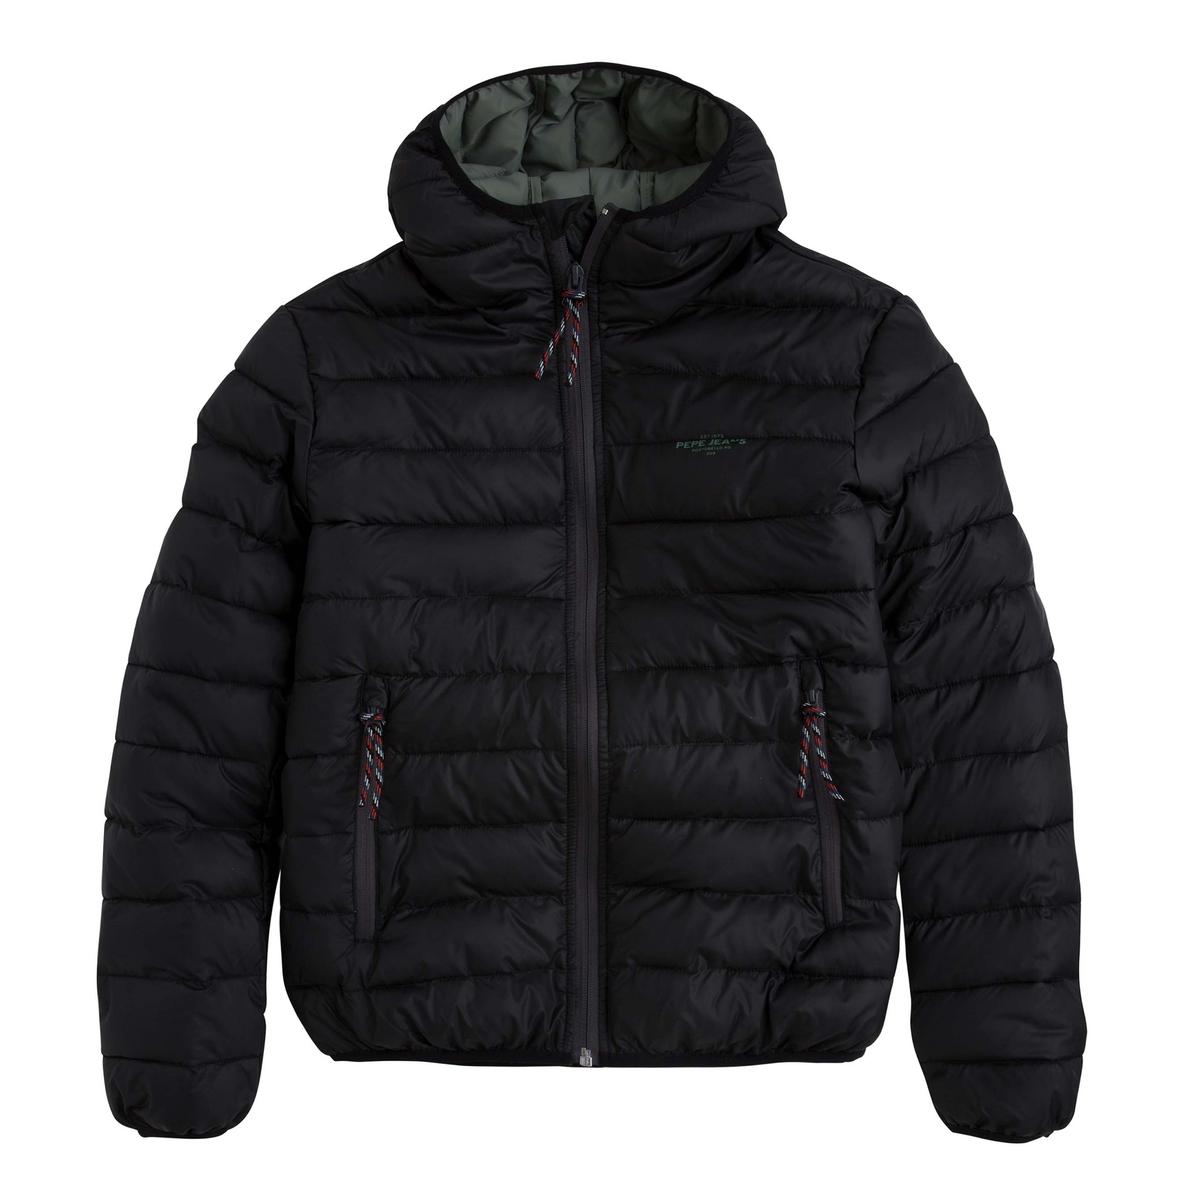 Куртка стеганая короткая с капюшоном WHITEHALL